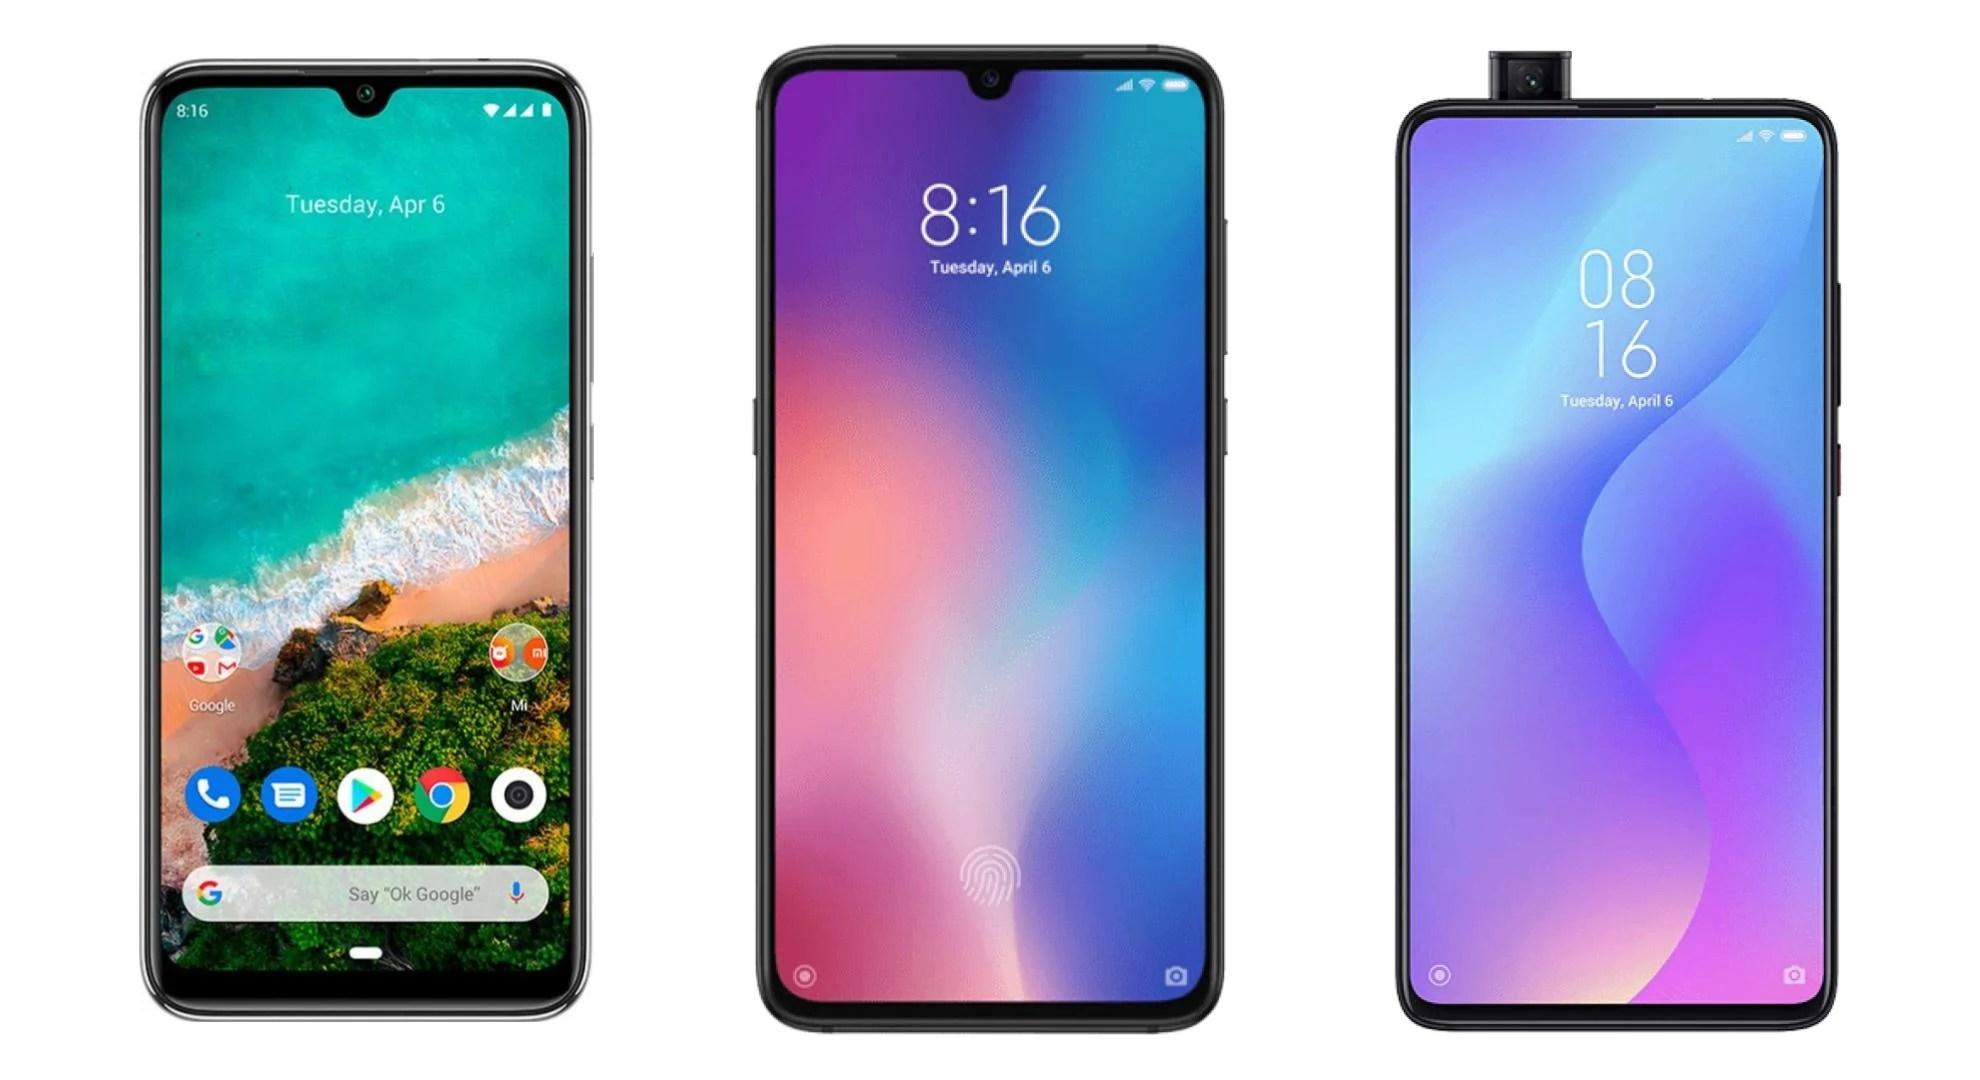 Quels sont les meilleurs smartphones Xiaomi en 2020 ? Notre avis